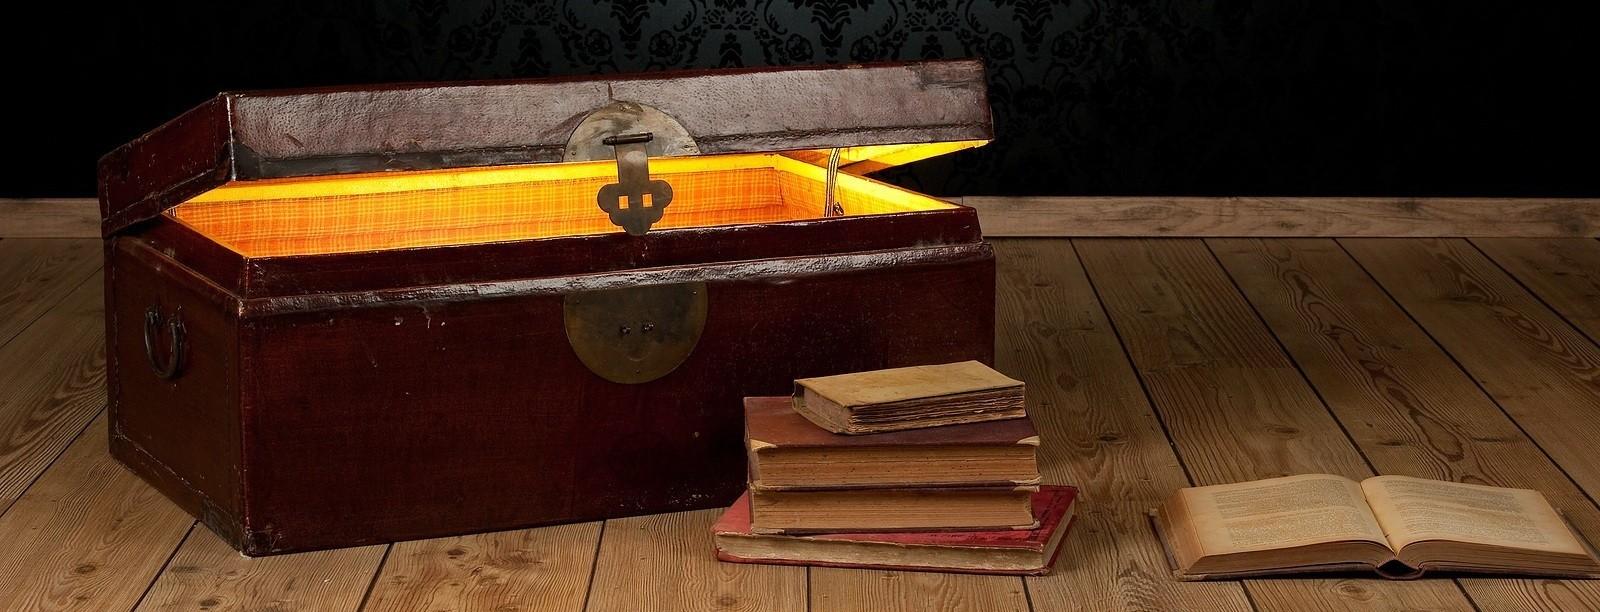 Lost Treasures, Contribute Page